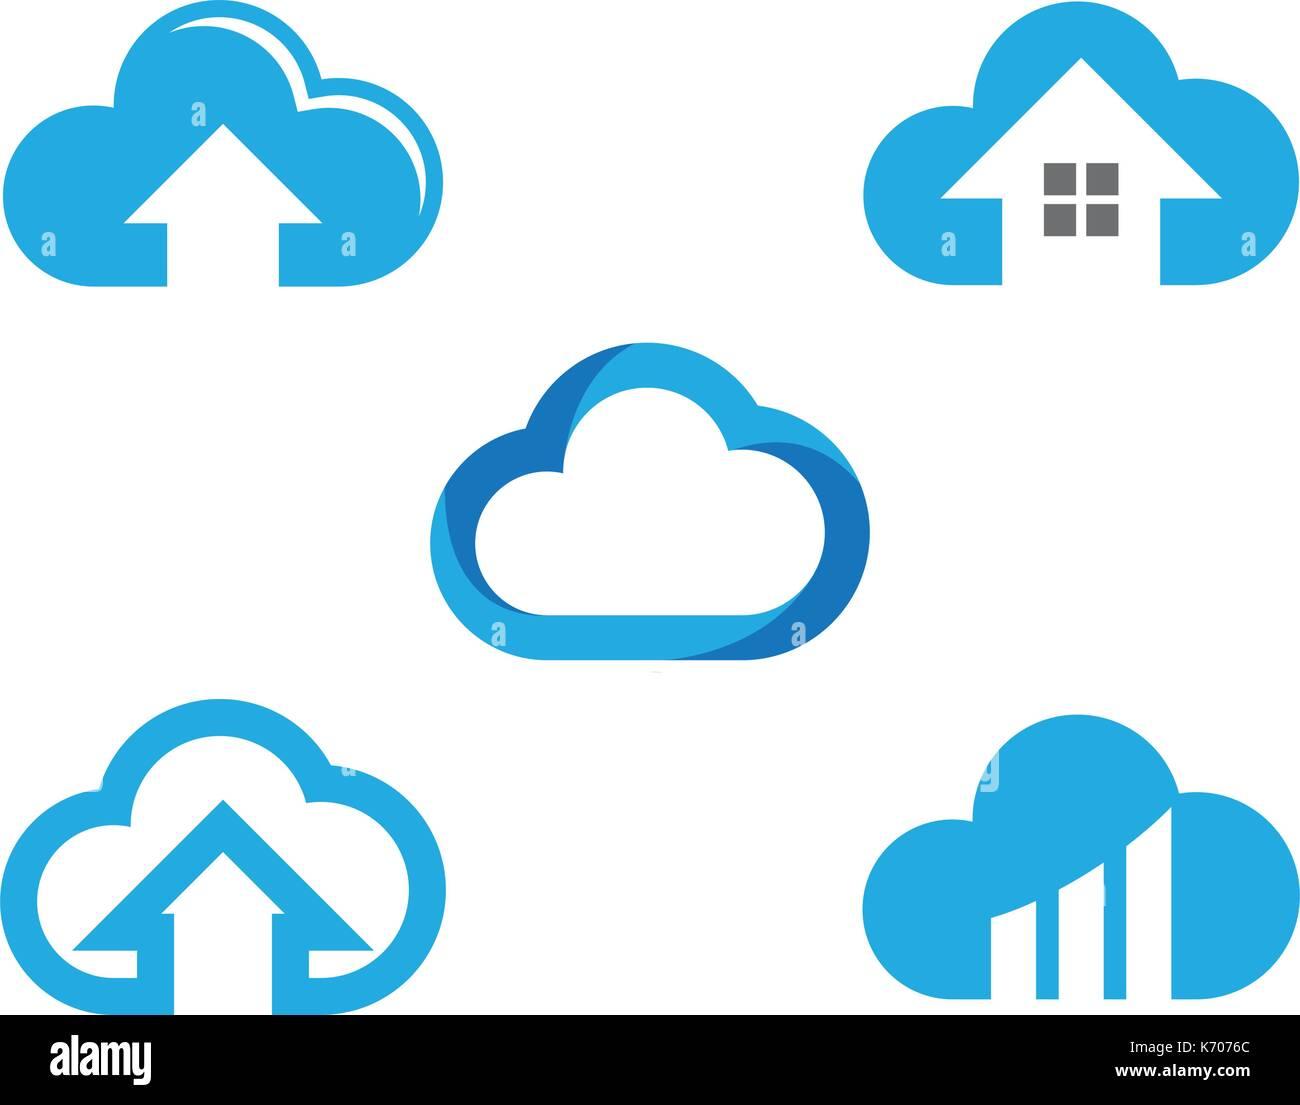 Cloud-Technologie Vektor-Logo Vorlage Design Vektor Vektor Abbildung ...